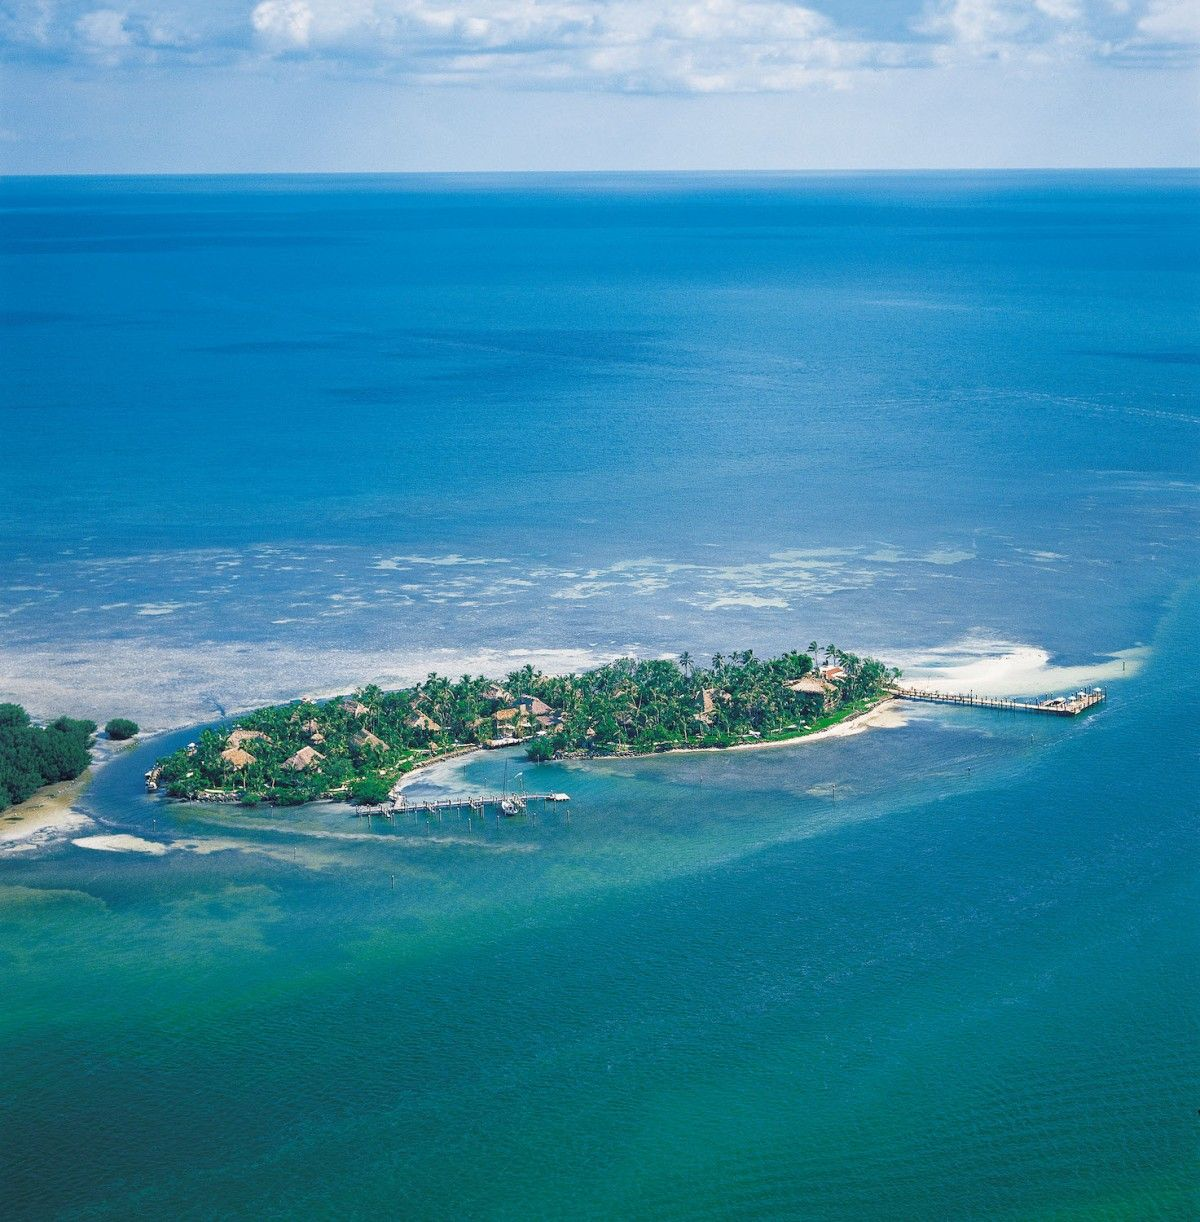 Private Island Beaches: Little Palm Island: The Ultimate Private Island